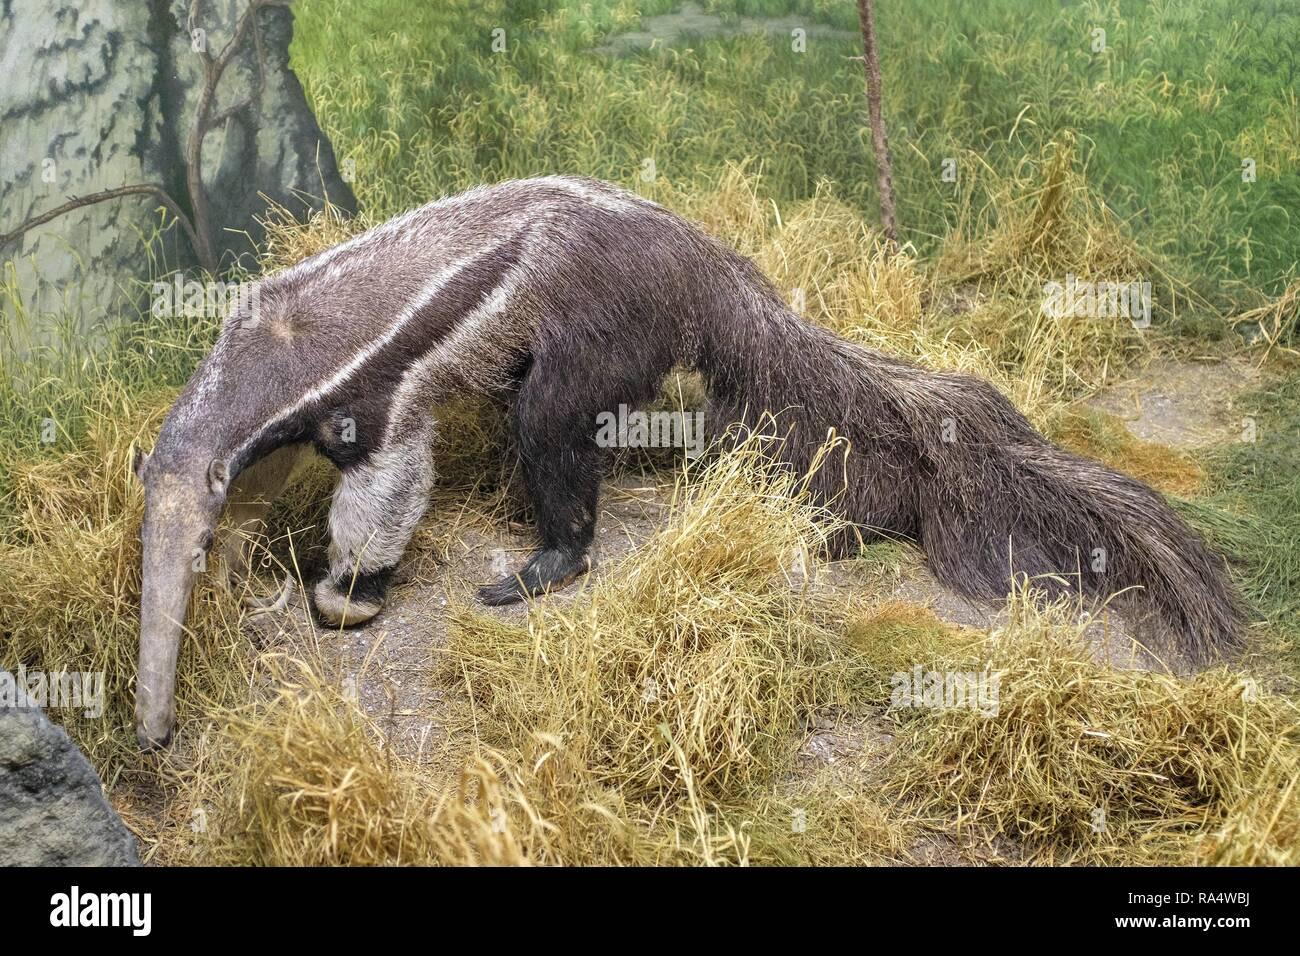 Dania - region Zealand - Kopenhaga - Muzeum Historii Naturalnej - Muzeum Zoologiczne , eksponat model - Mrowkojad wielki Denmark - Zealand region - Copenhagen - Natural History Museum - Zoological Mus - Stock Image